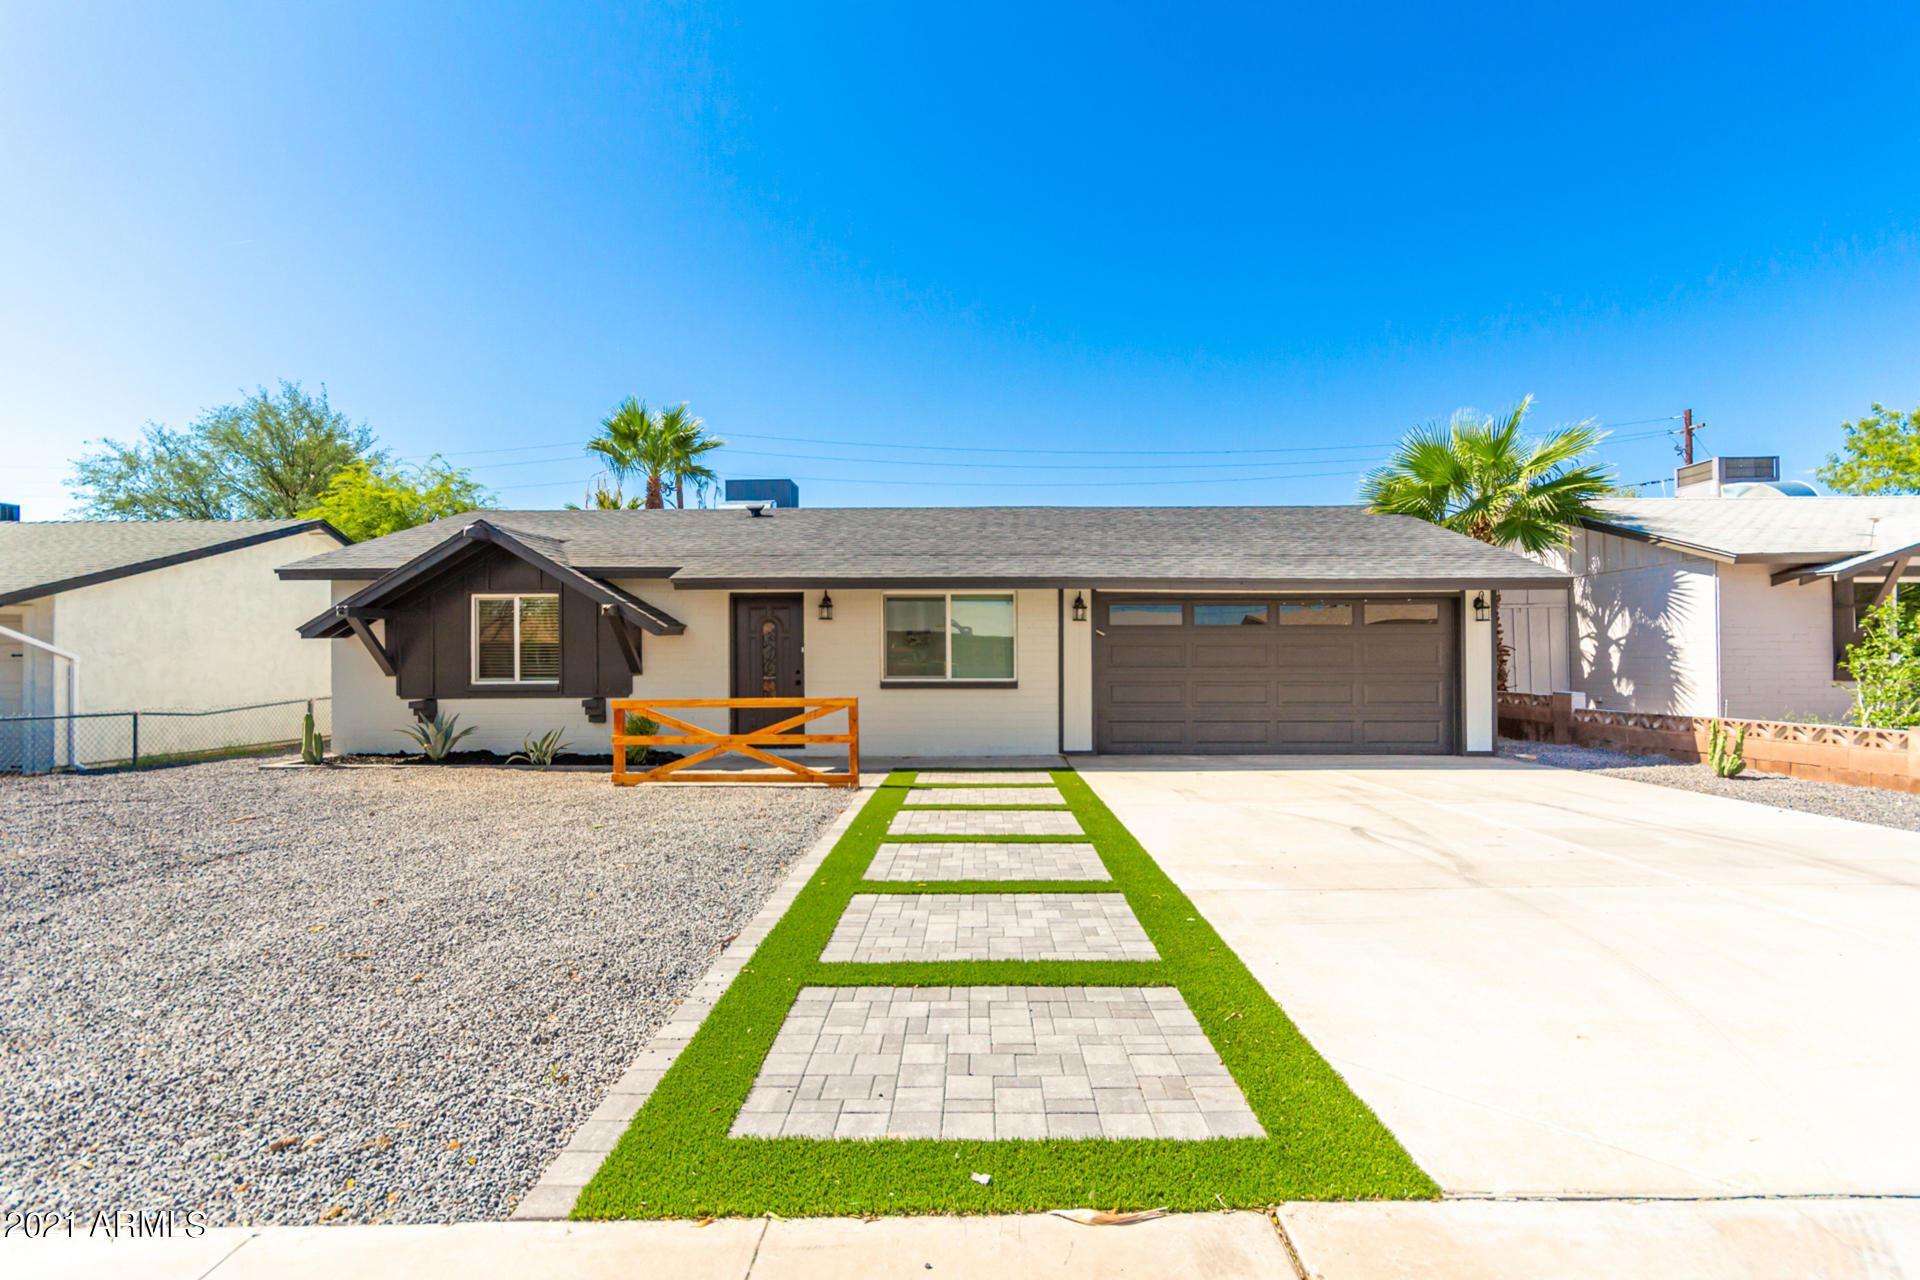 Photo of 605 E PAPAGO Drive, Tempe, AZ 85281 (MLS # 6272560)